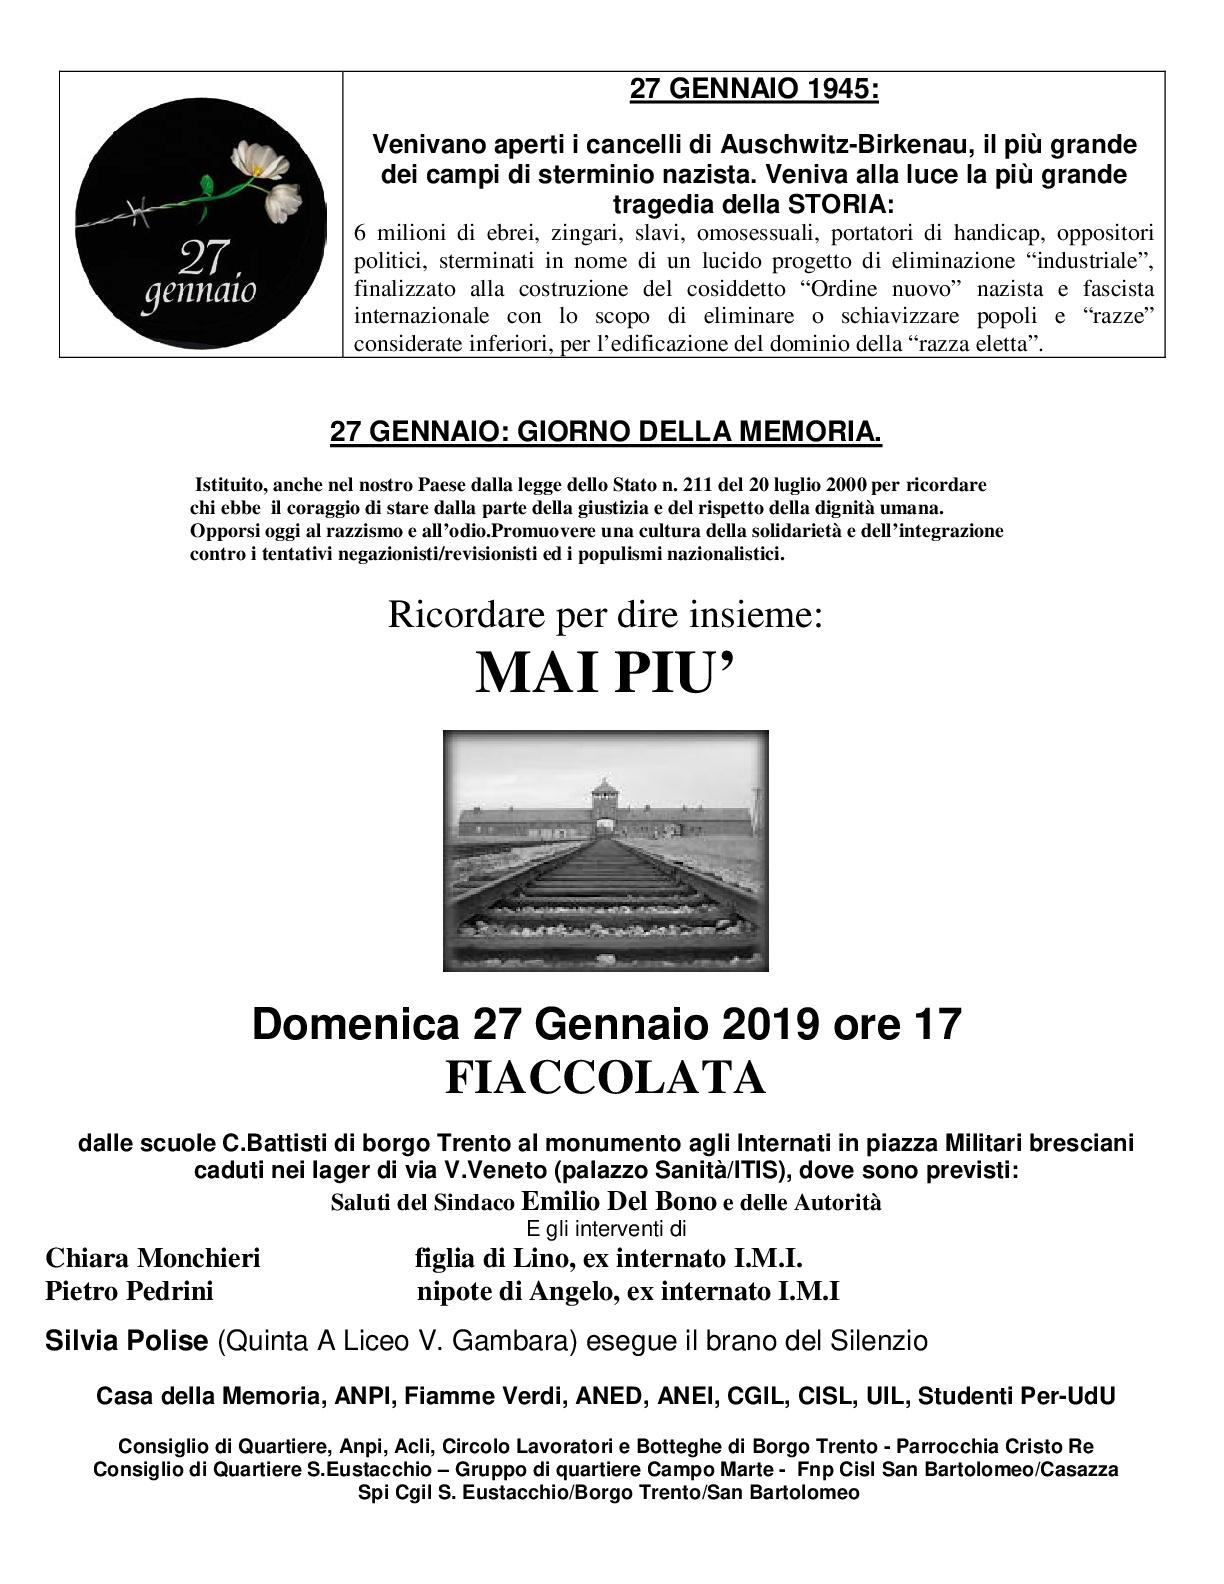 fiaccolata 2019 Borgo Trento-001